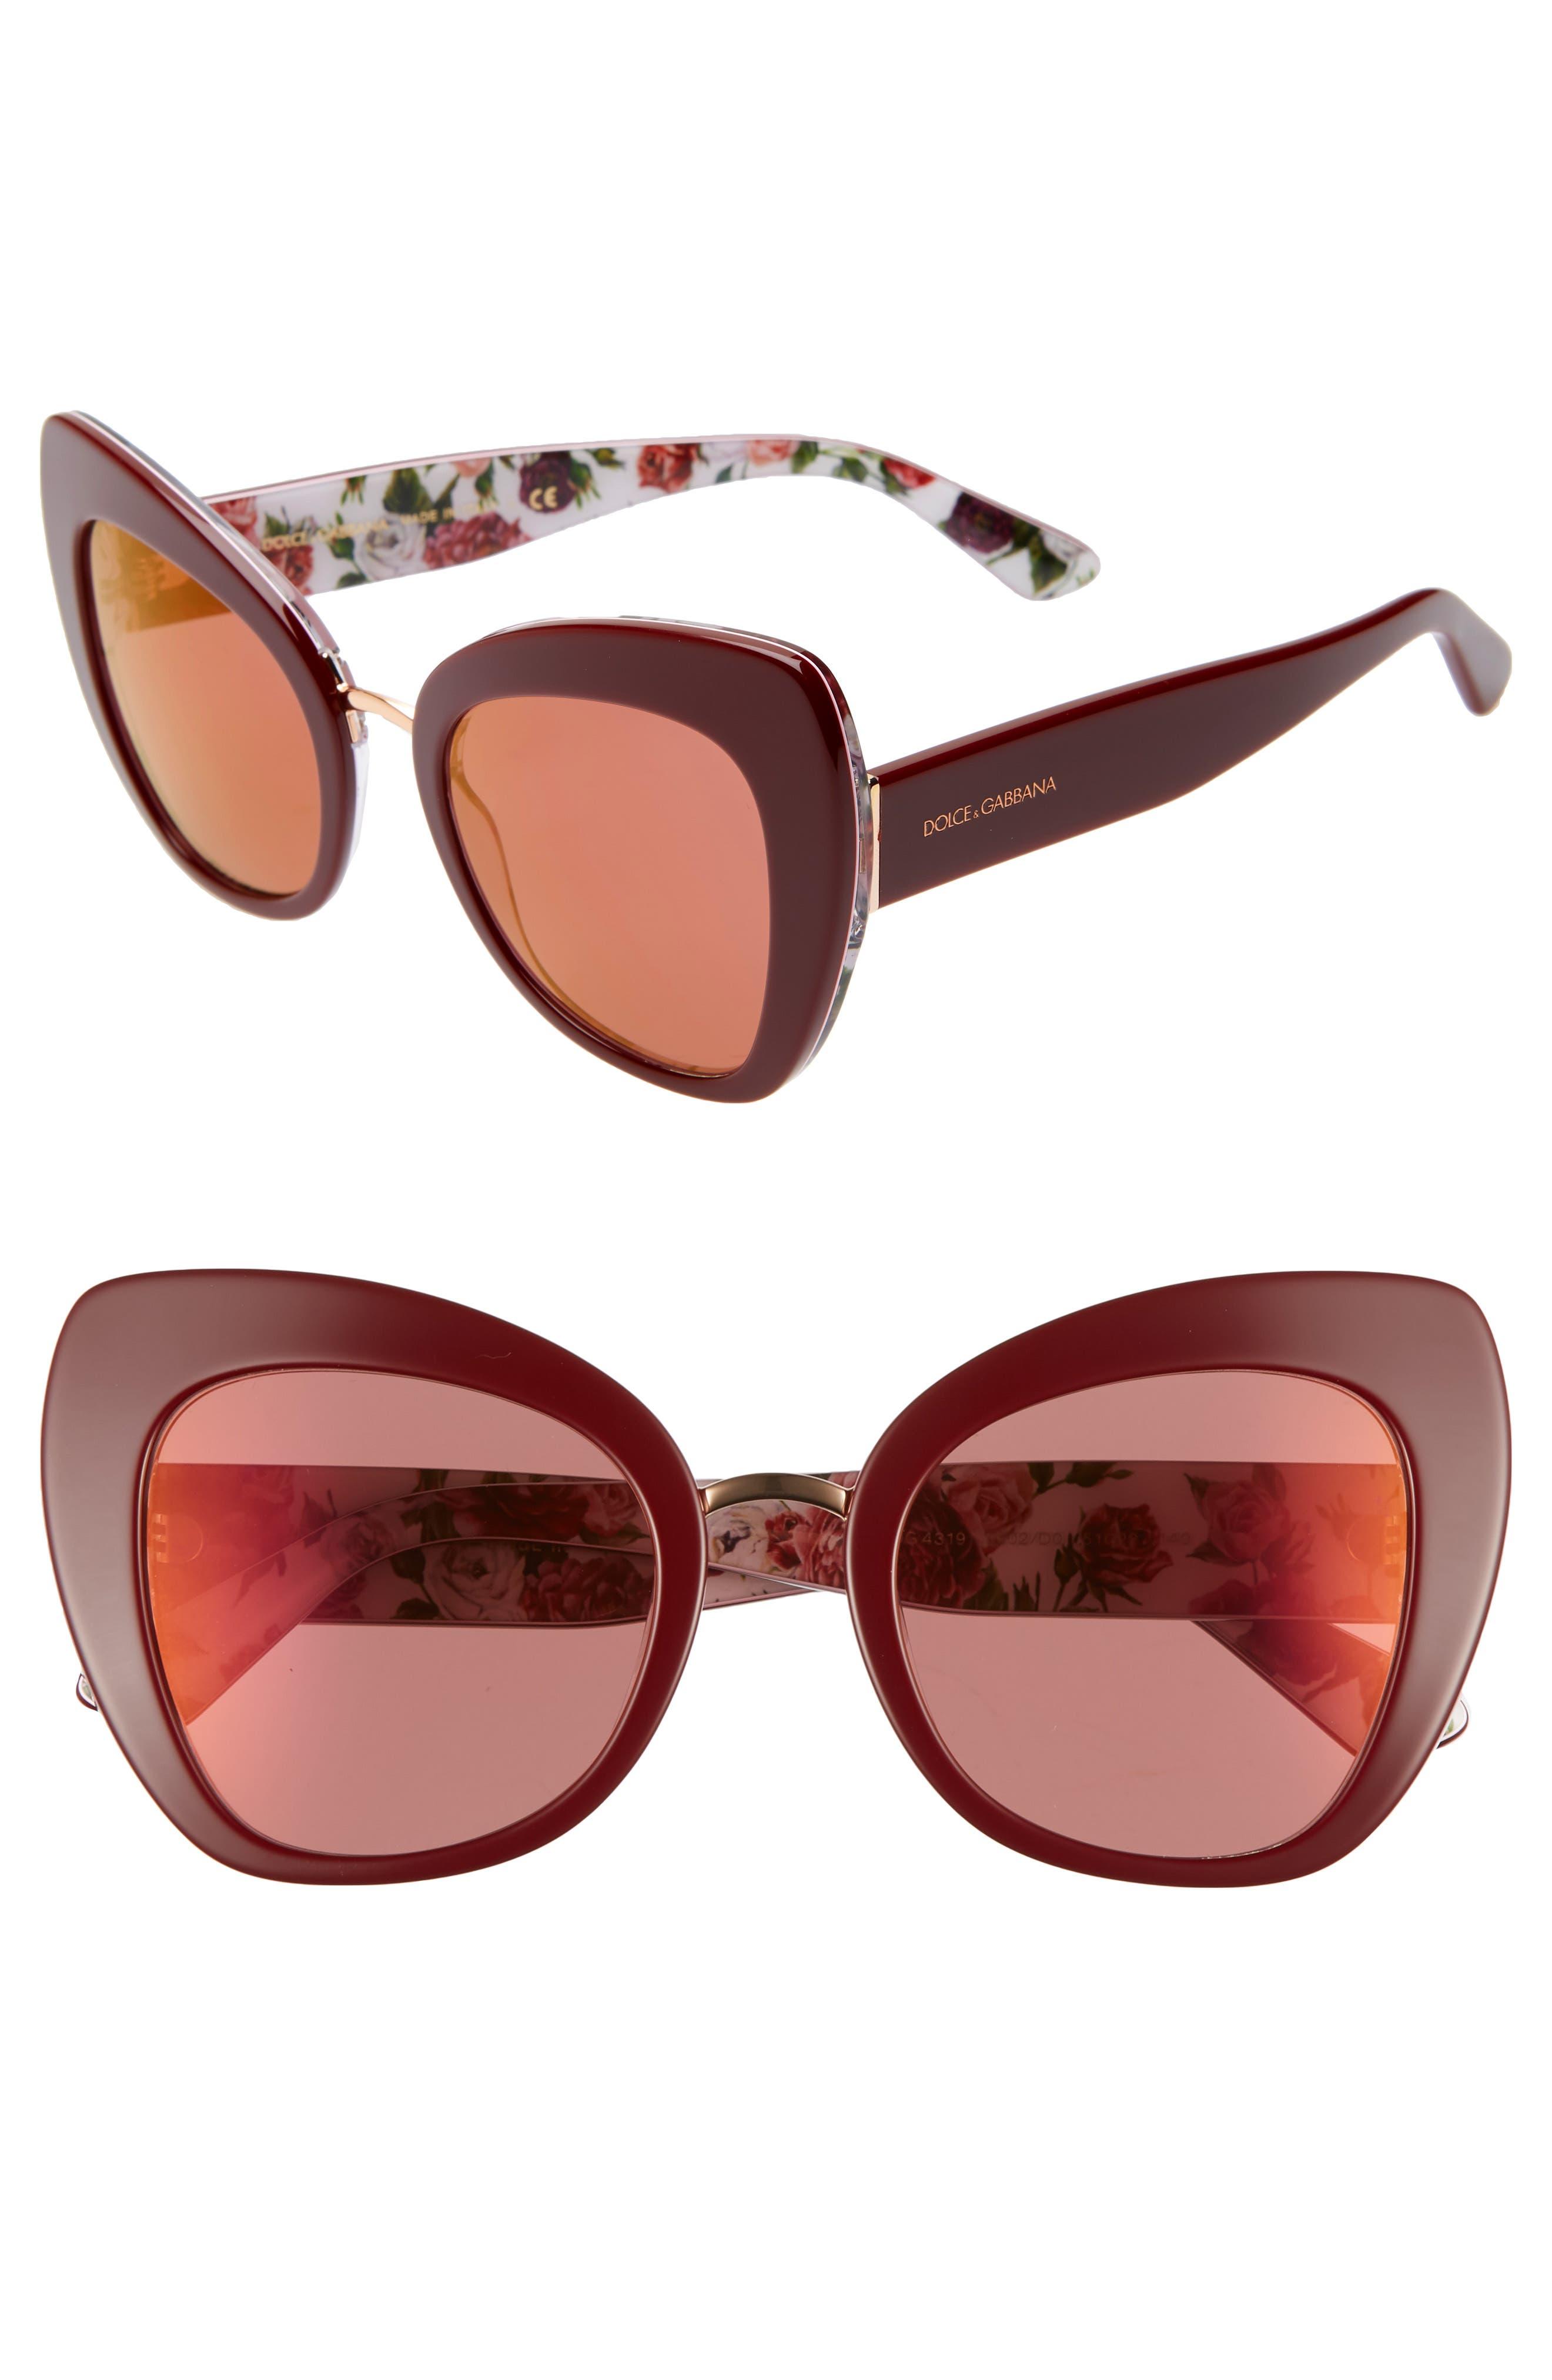 0ef026067c9f Dolce Gabbana Sunglasses for Women